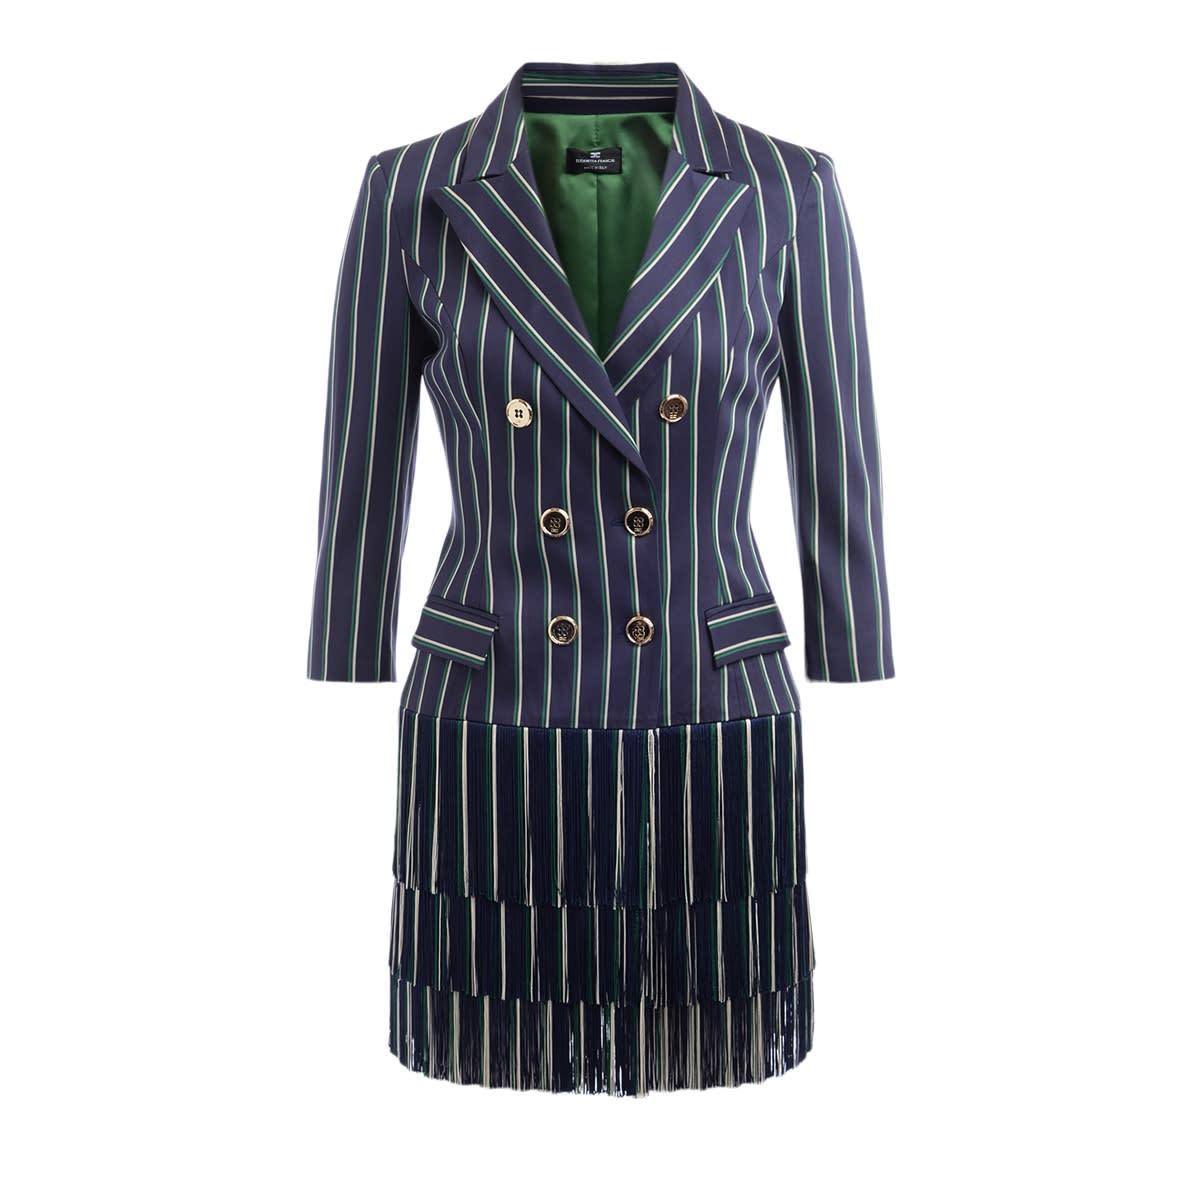 Buy Double-breasted Elisabetta Franchi Multi-stripe Dress online, shop Elisabetta Franchi Celyn B. with free shipping